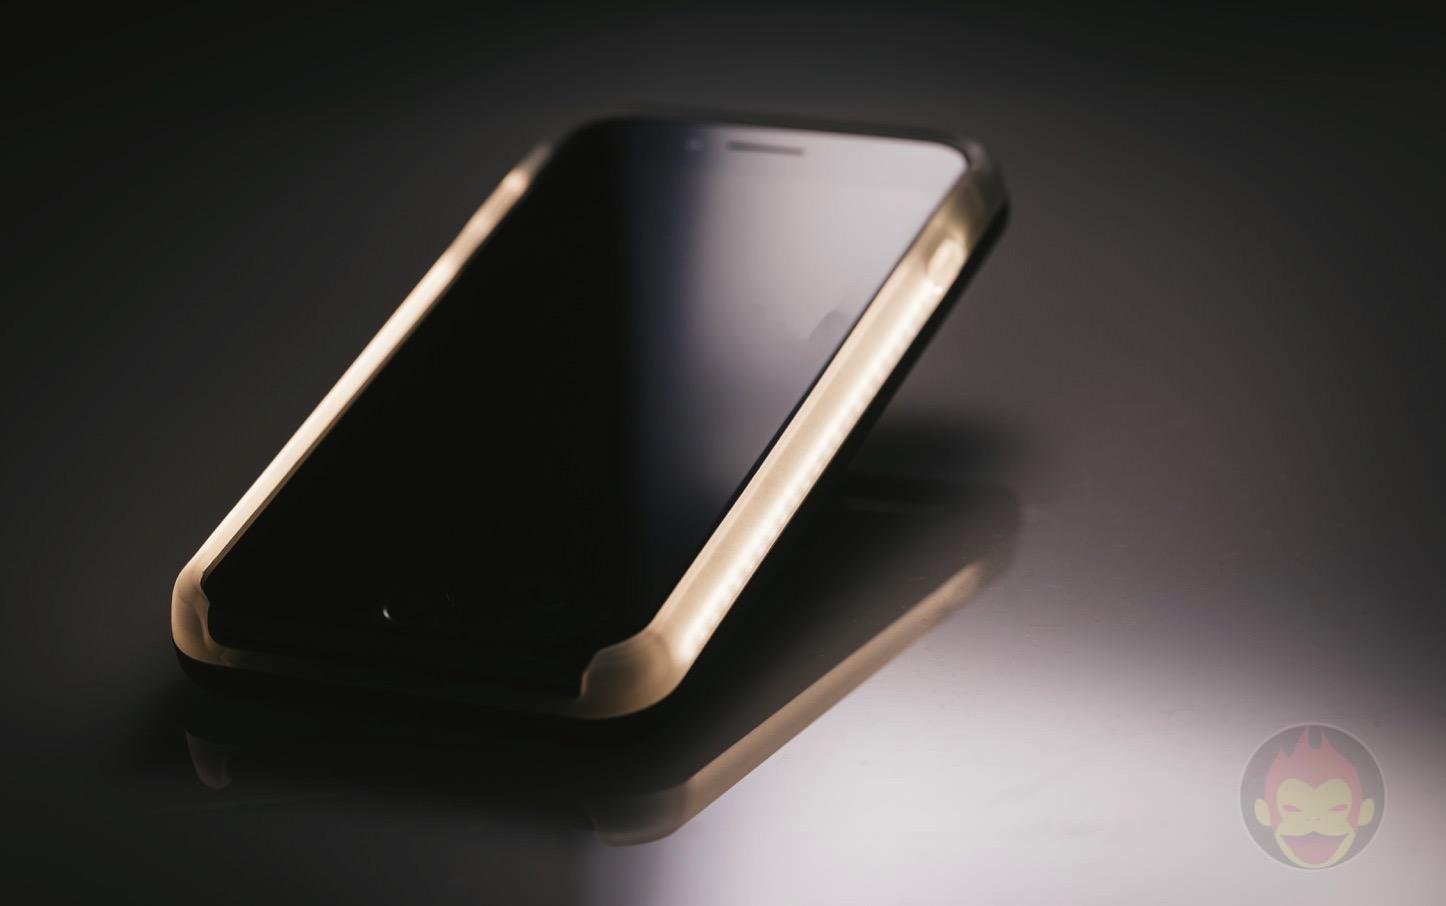 LuMee-Duo-LED-Lighting-Case-04.jpg